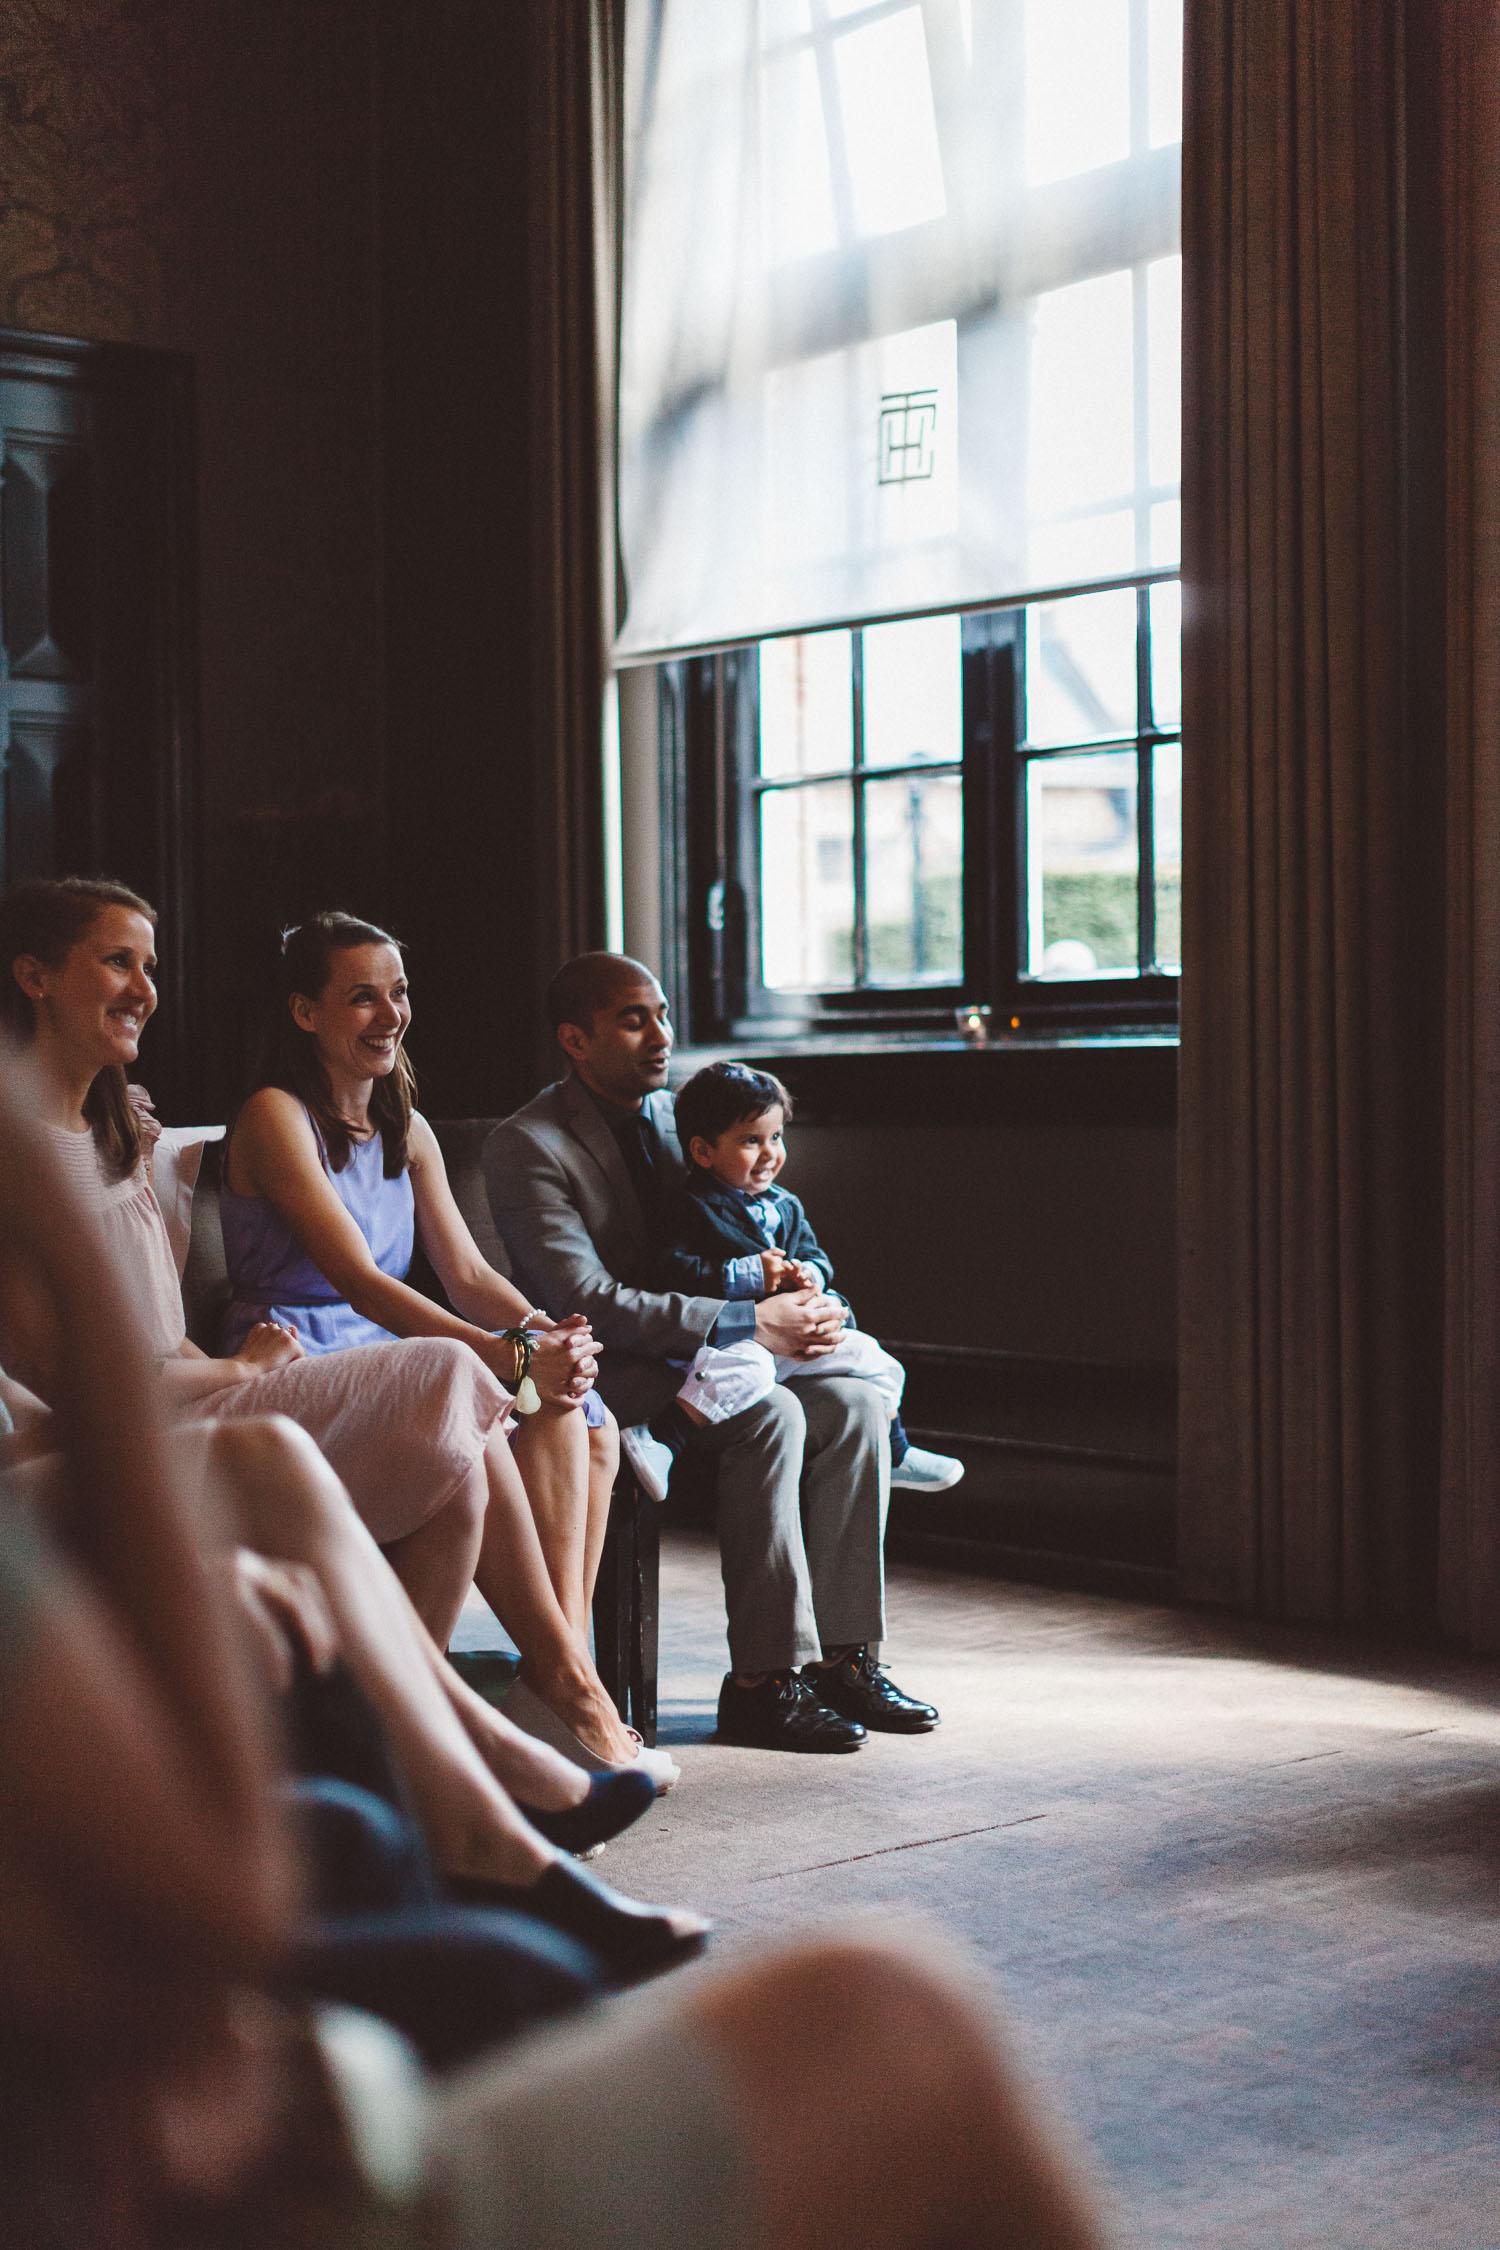 Wedding-huwelijk-trouwen-bruiloft-photography-fotografie-fotograaf-photographer-Rijksmuseum-College-Hotel-On-a-hazy-morning-Amsterdam-The-Netherlands-203.jpg